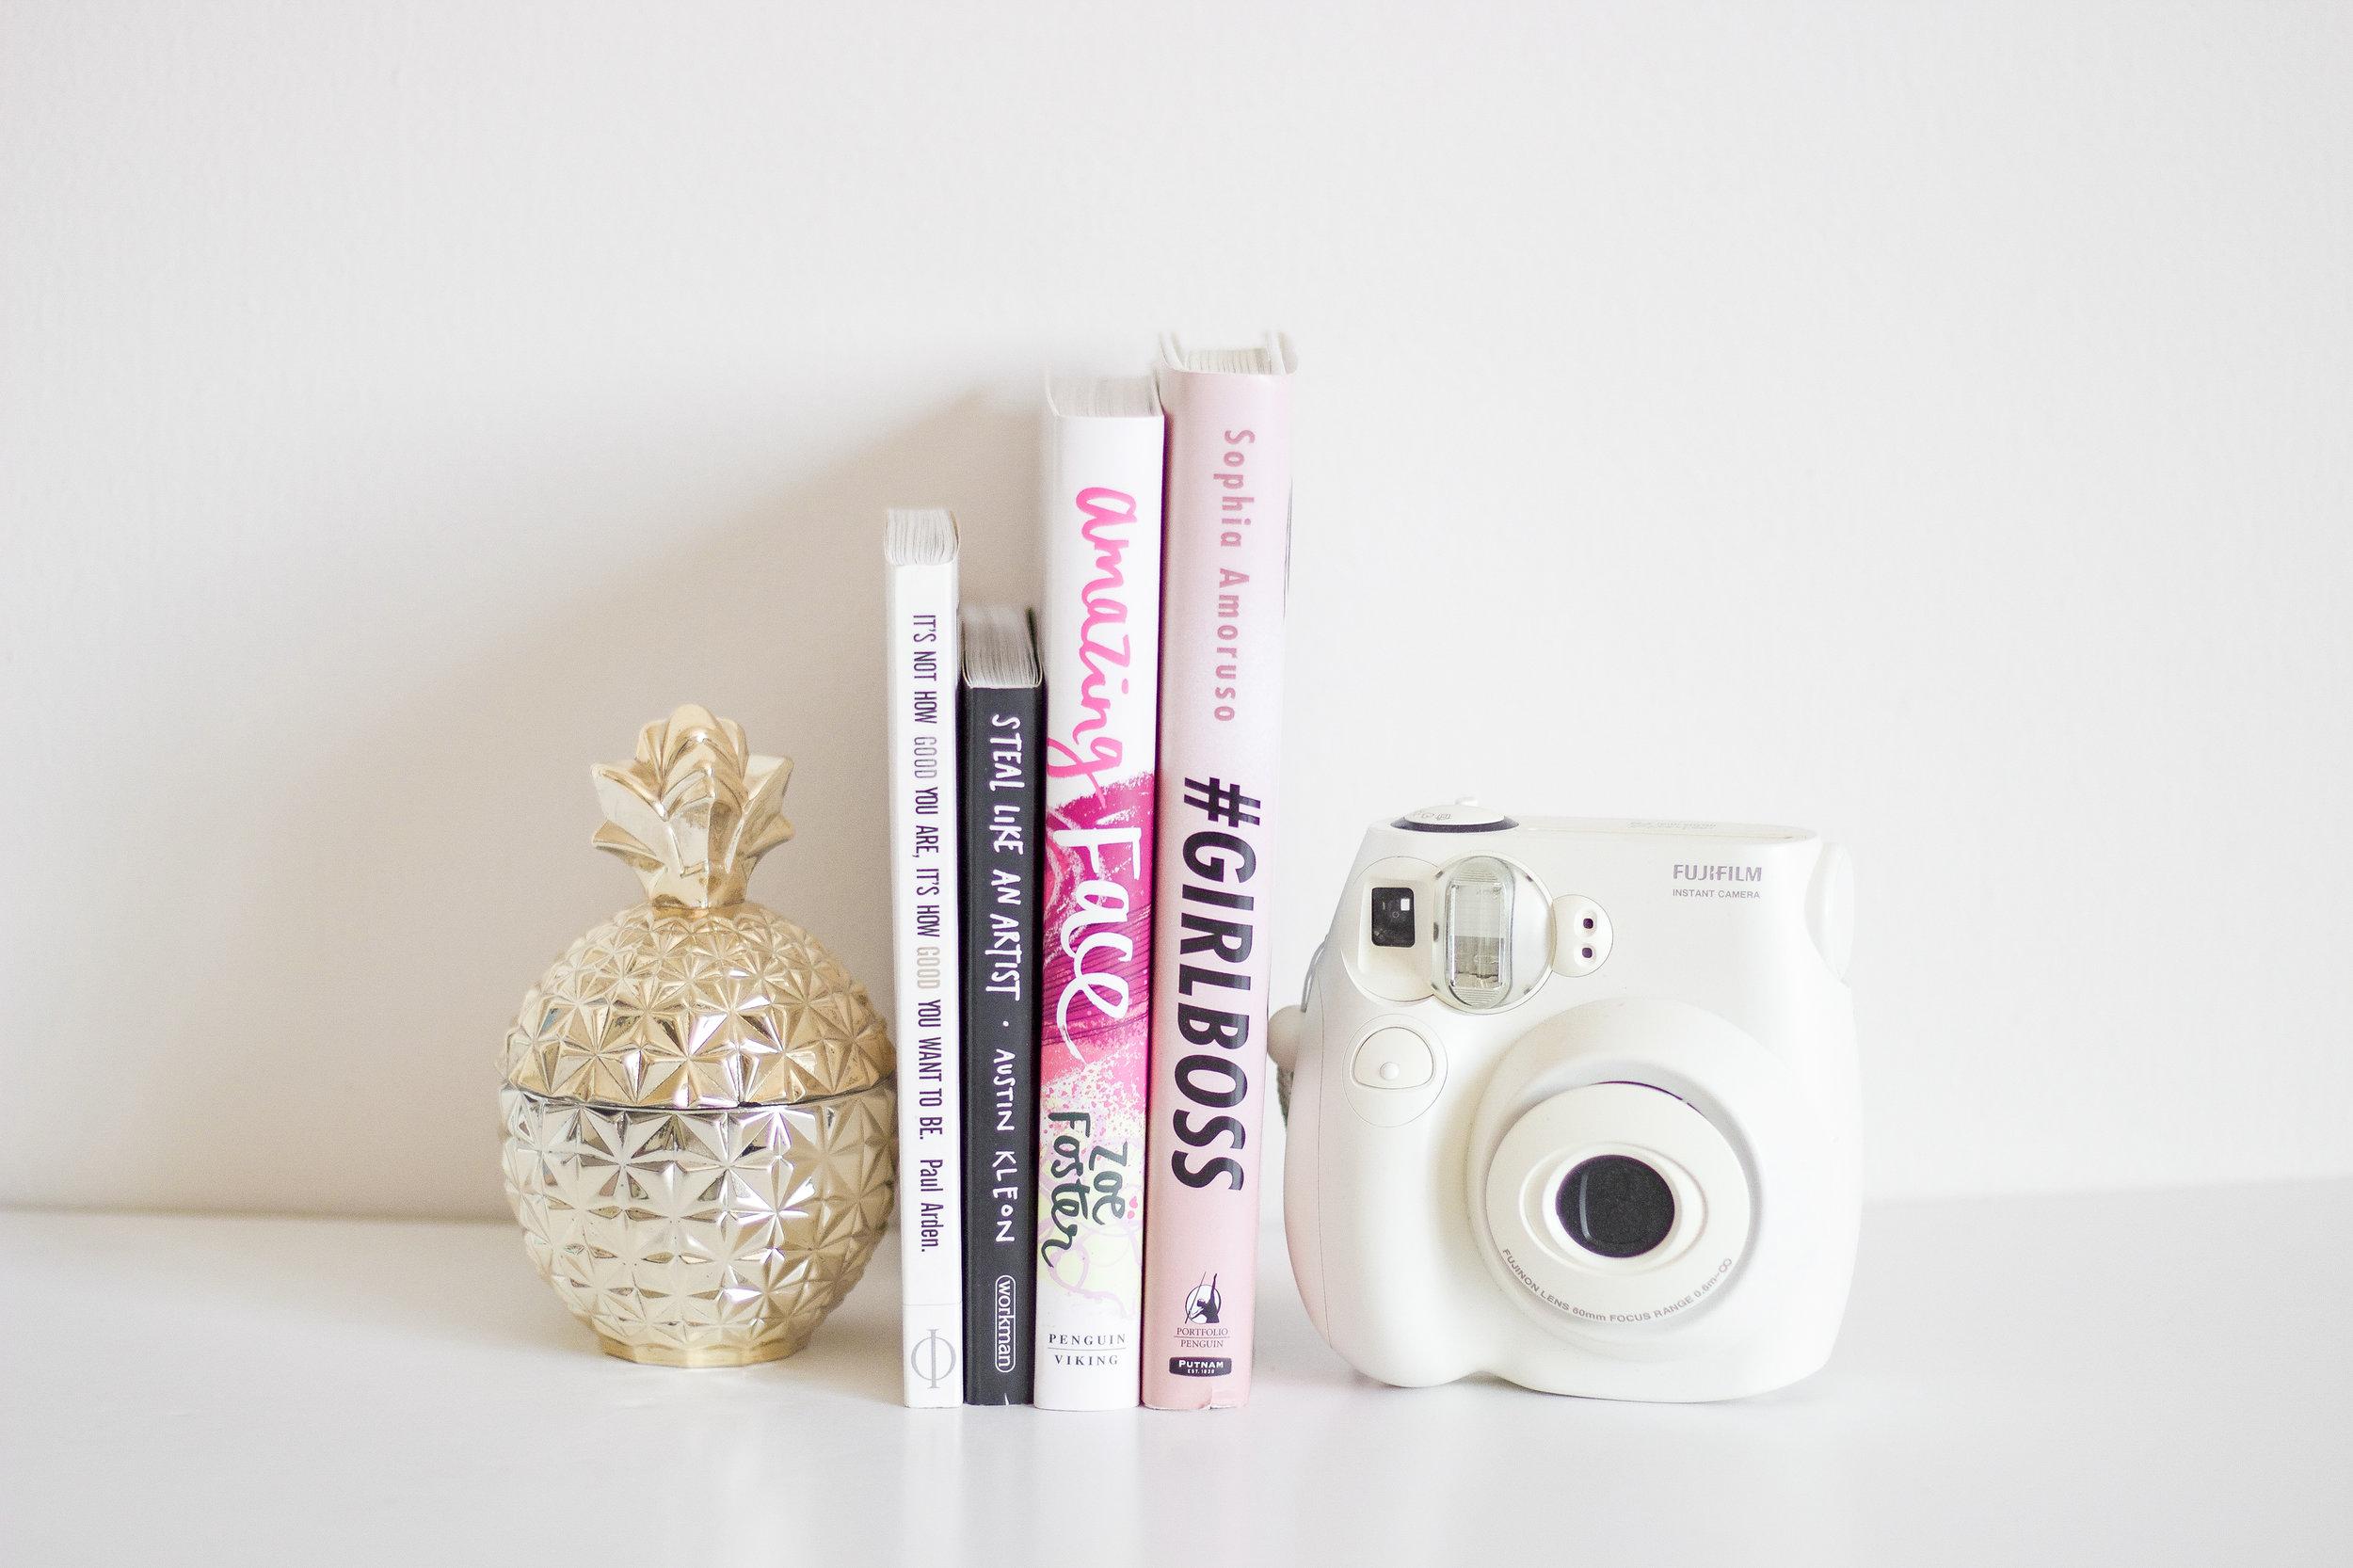 books-toy-camera-pineapple-jar.jpg